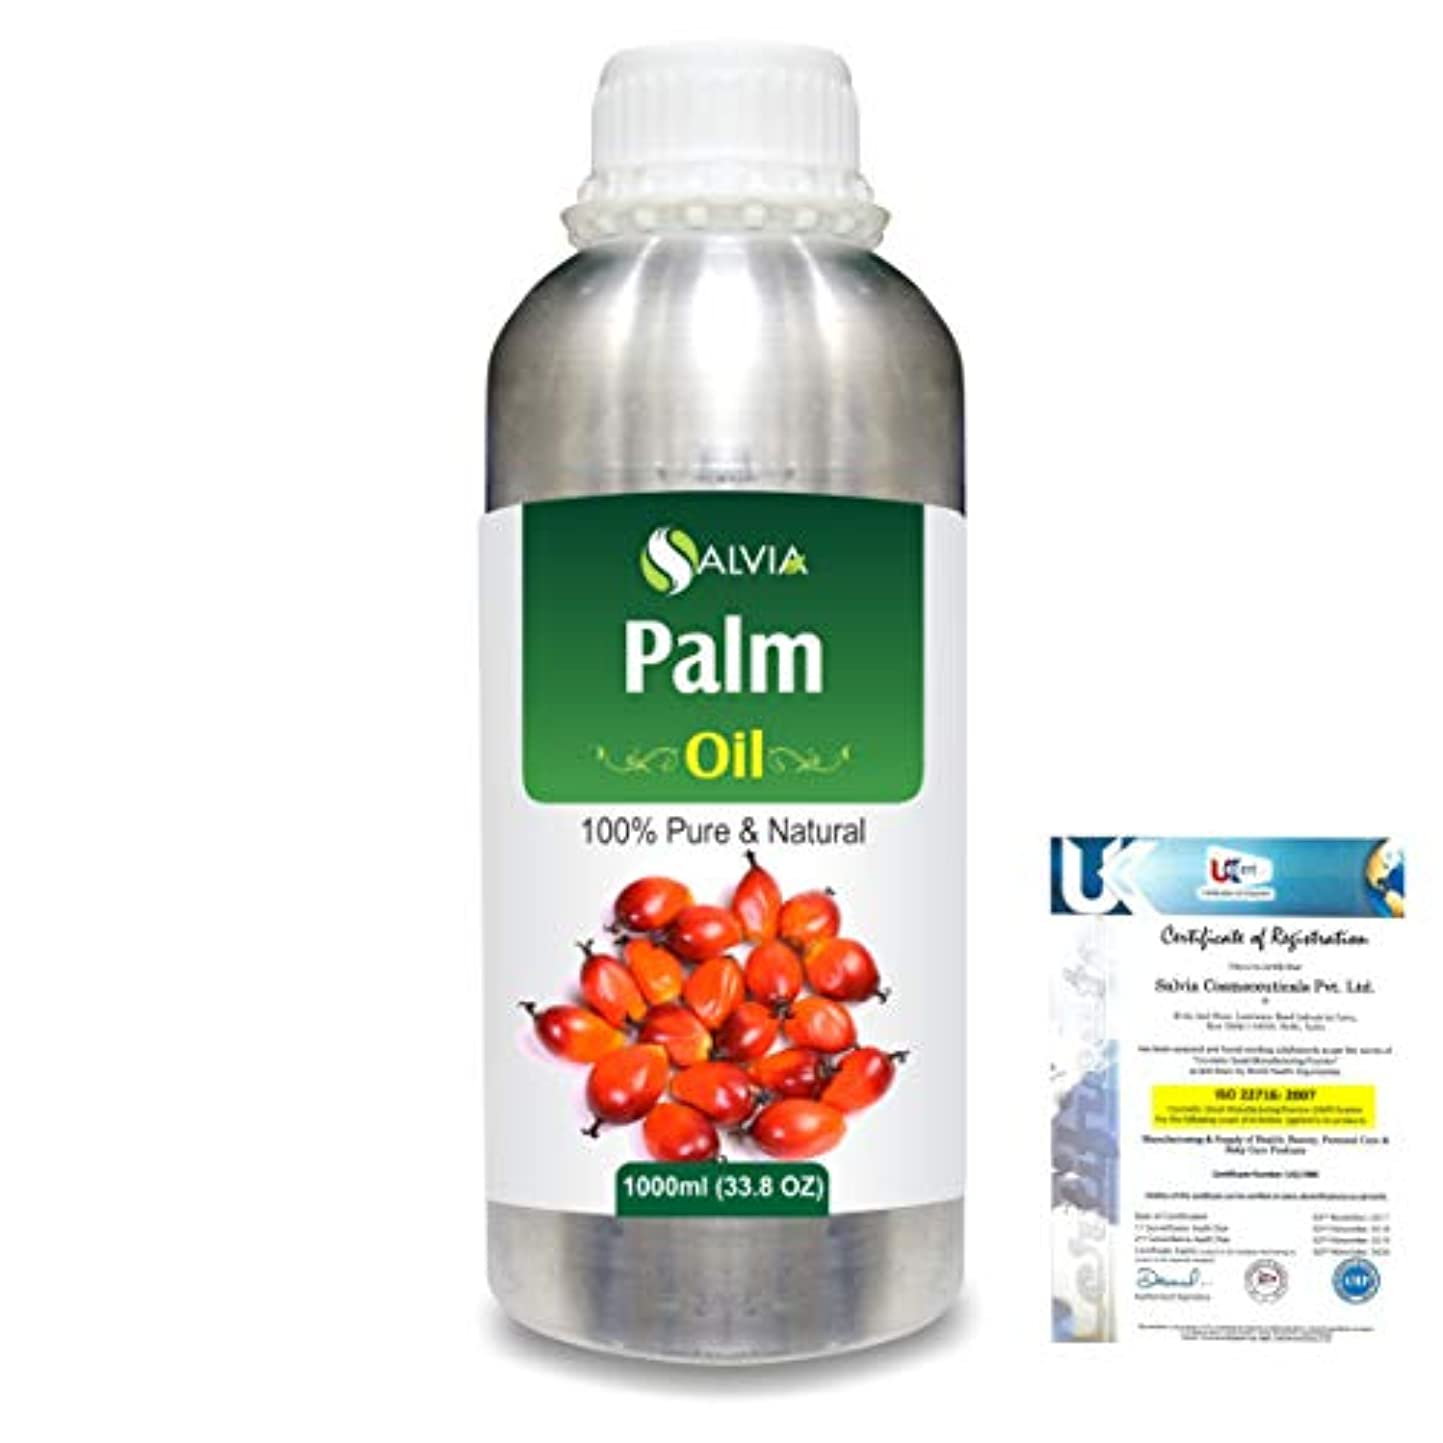 地区入場料土砂降りPalm (Elaeis guineensis)100% Natural Pure Carrier Oil 1000ml/33.8fl.oz.